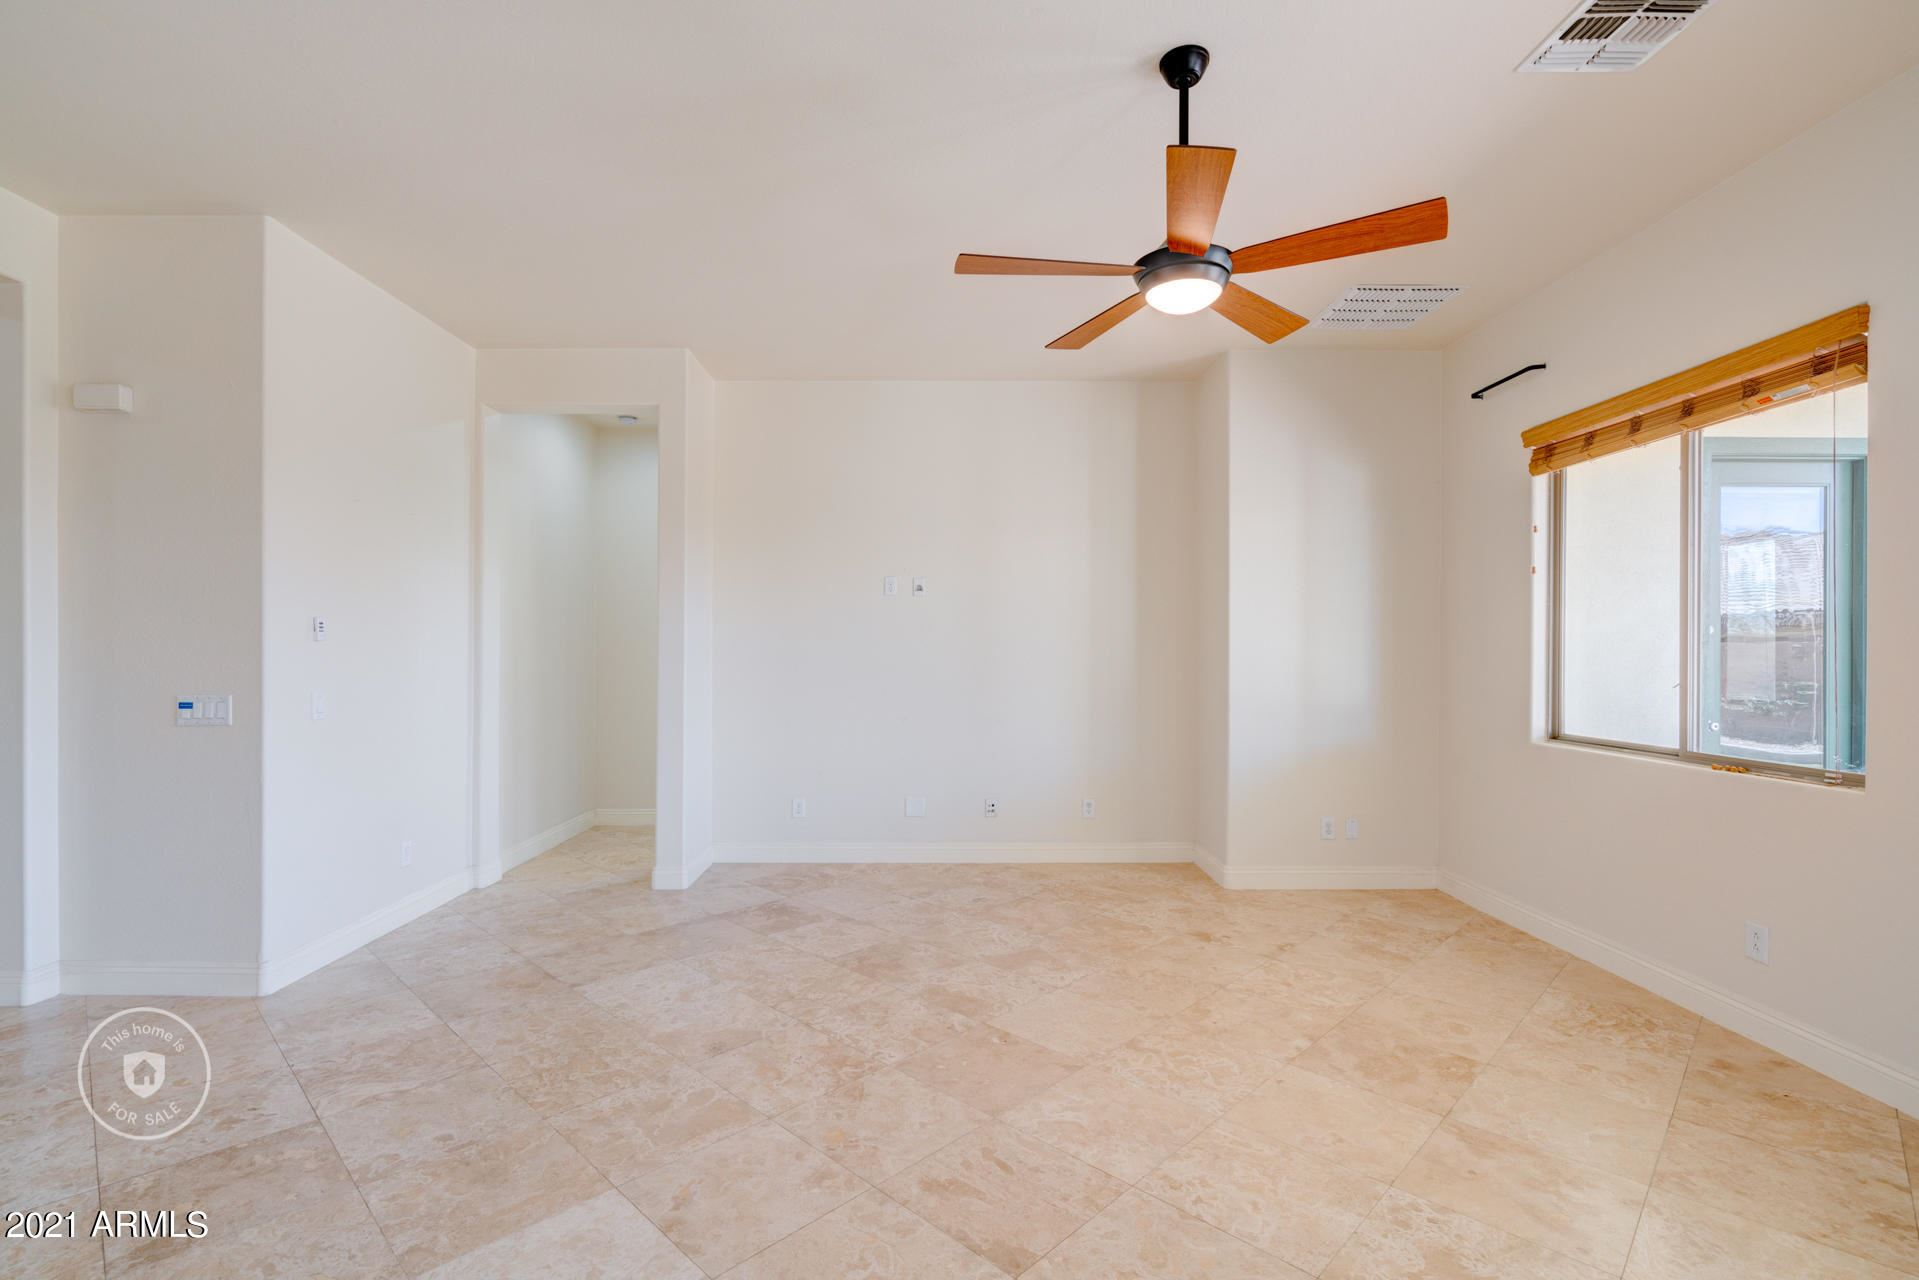 Photo of 13750 S 176TH Avenue, Goodyear, AZ 85338 (MLS # 6200769)